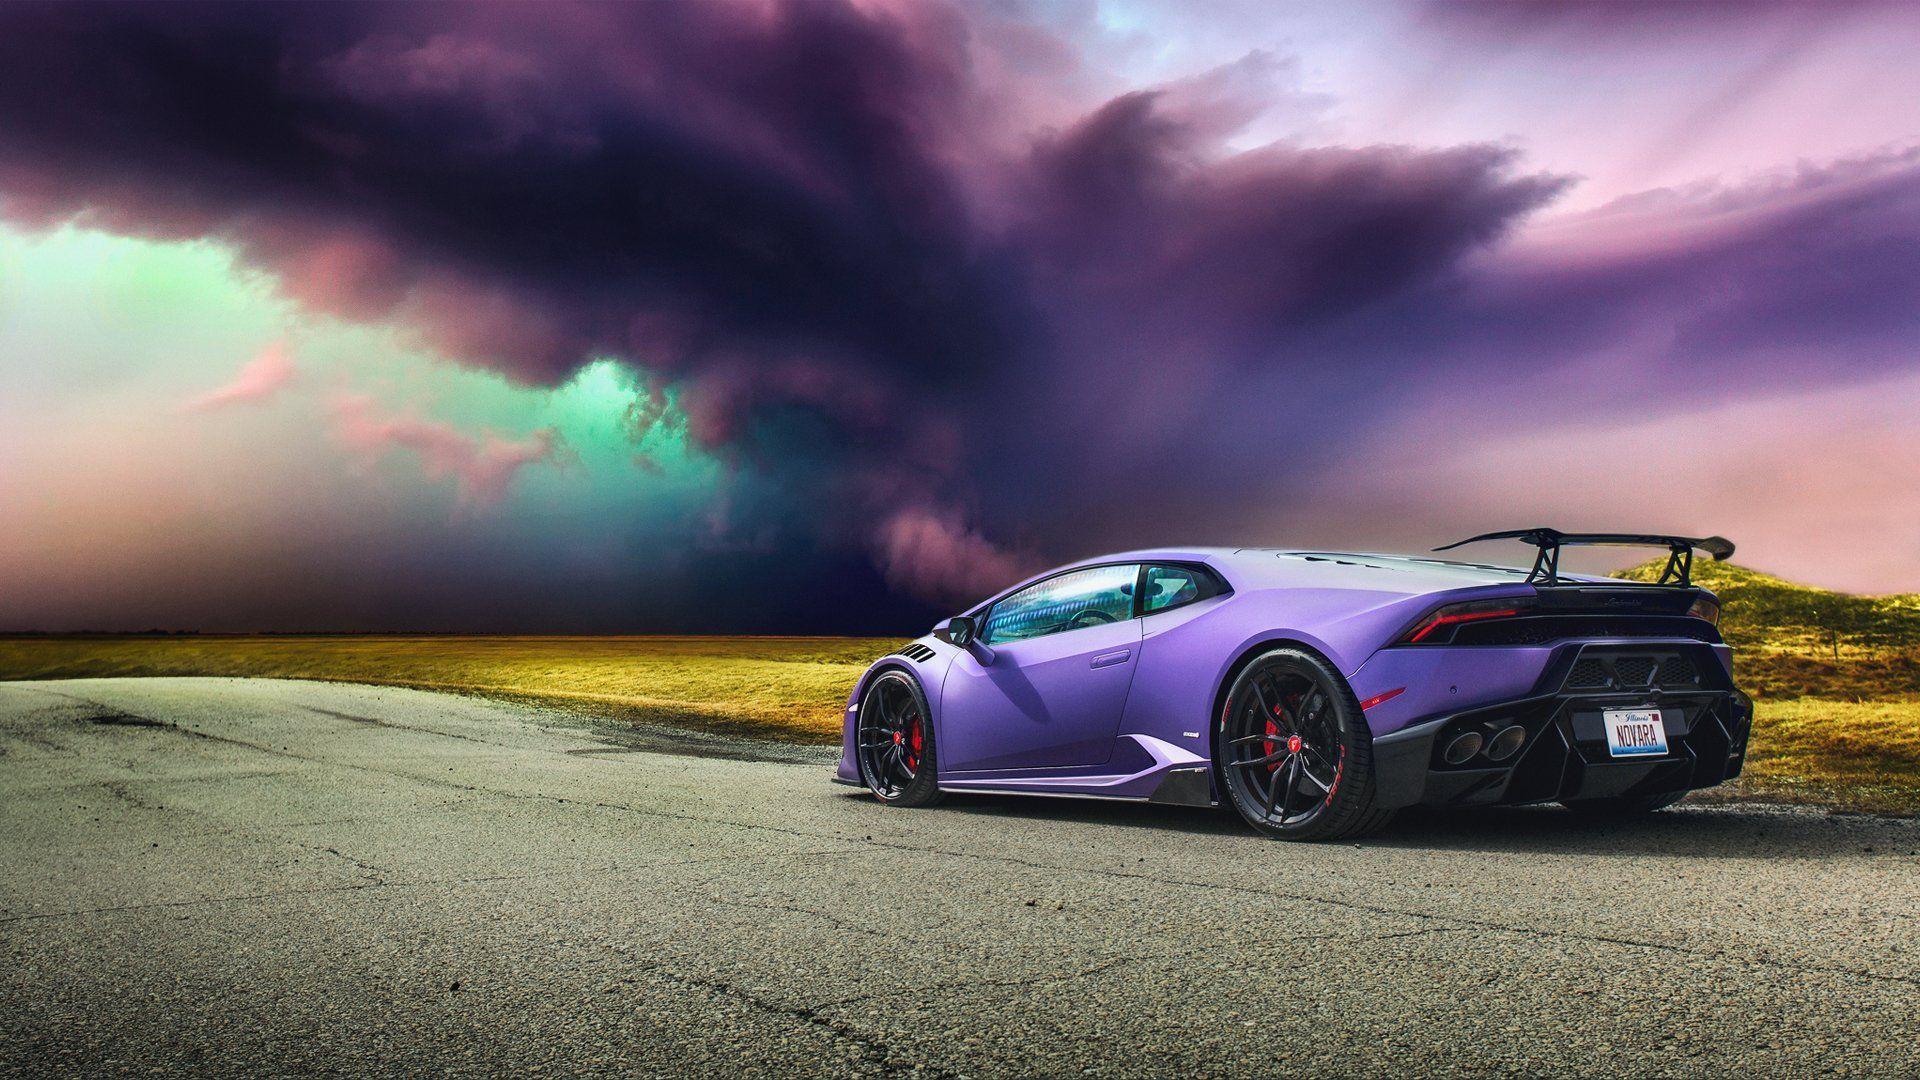 Purple Car Wallpapers Top Free Purple Car Backgrounds